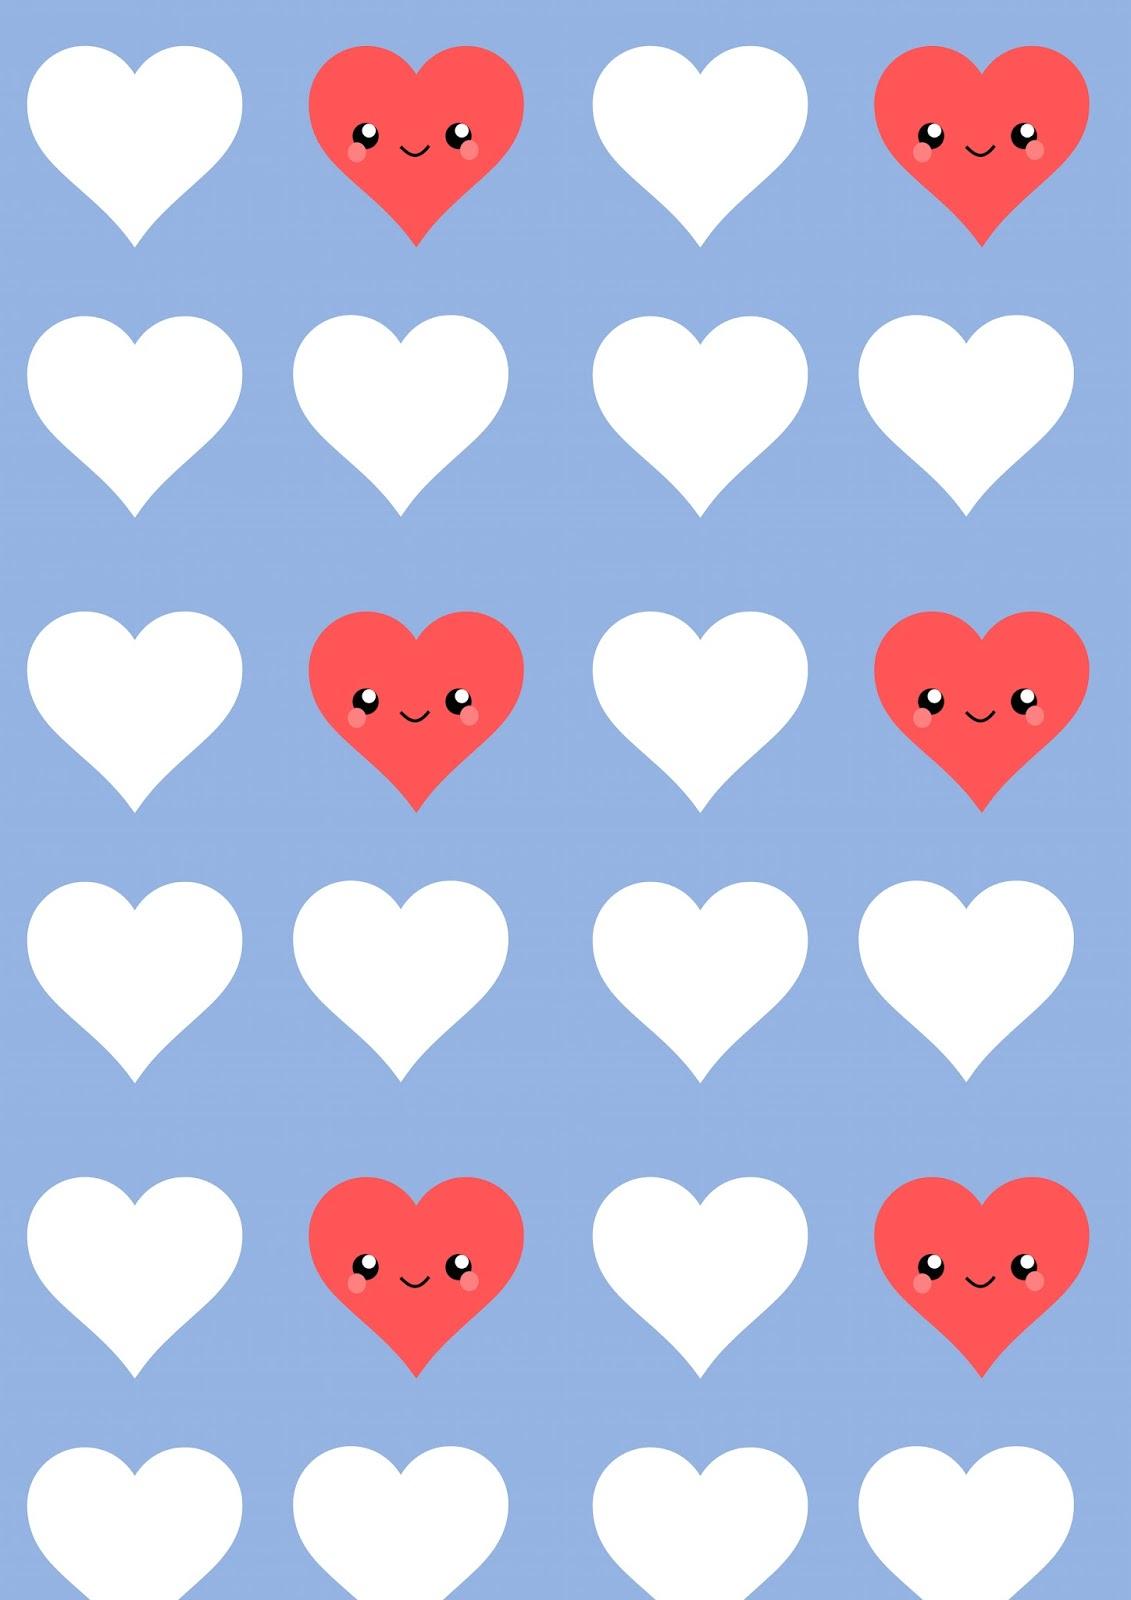 http://4.bp.blogspot.com/-r6U72D19NcU/VM-TauRfaUI/AAAAAAAAh88/LL6B7Y50Z_0/s1600/heart_paper_blue_A4.jpg